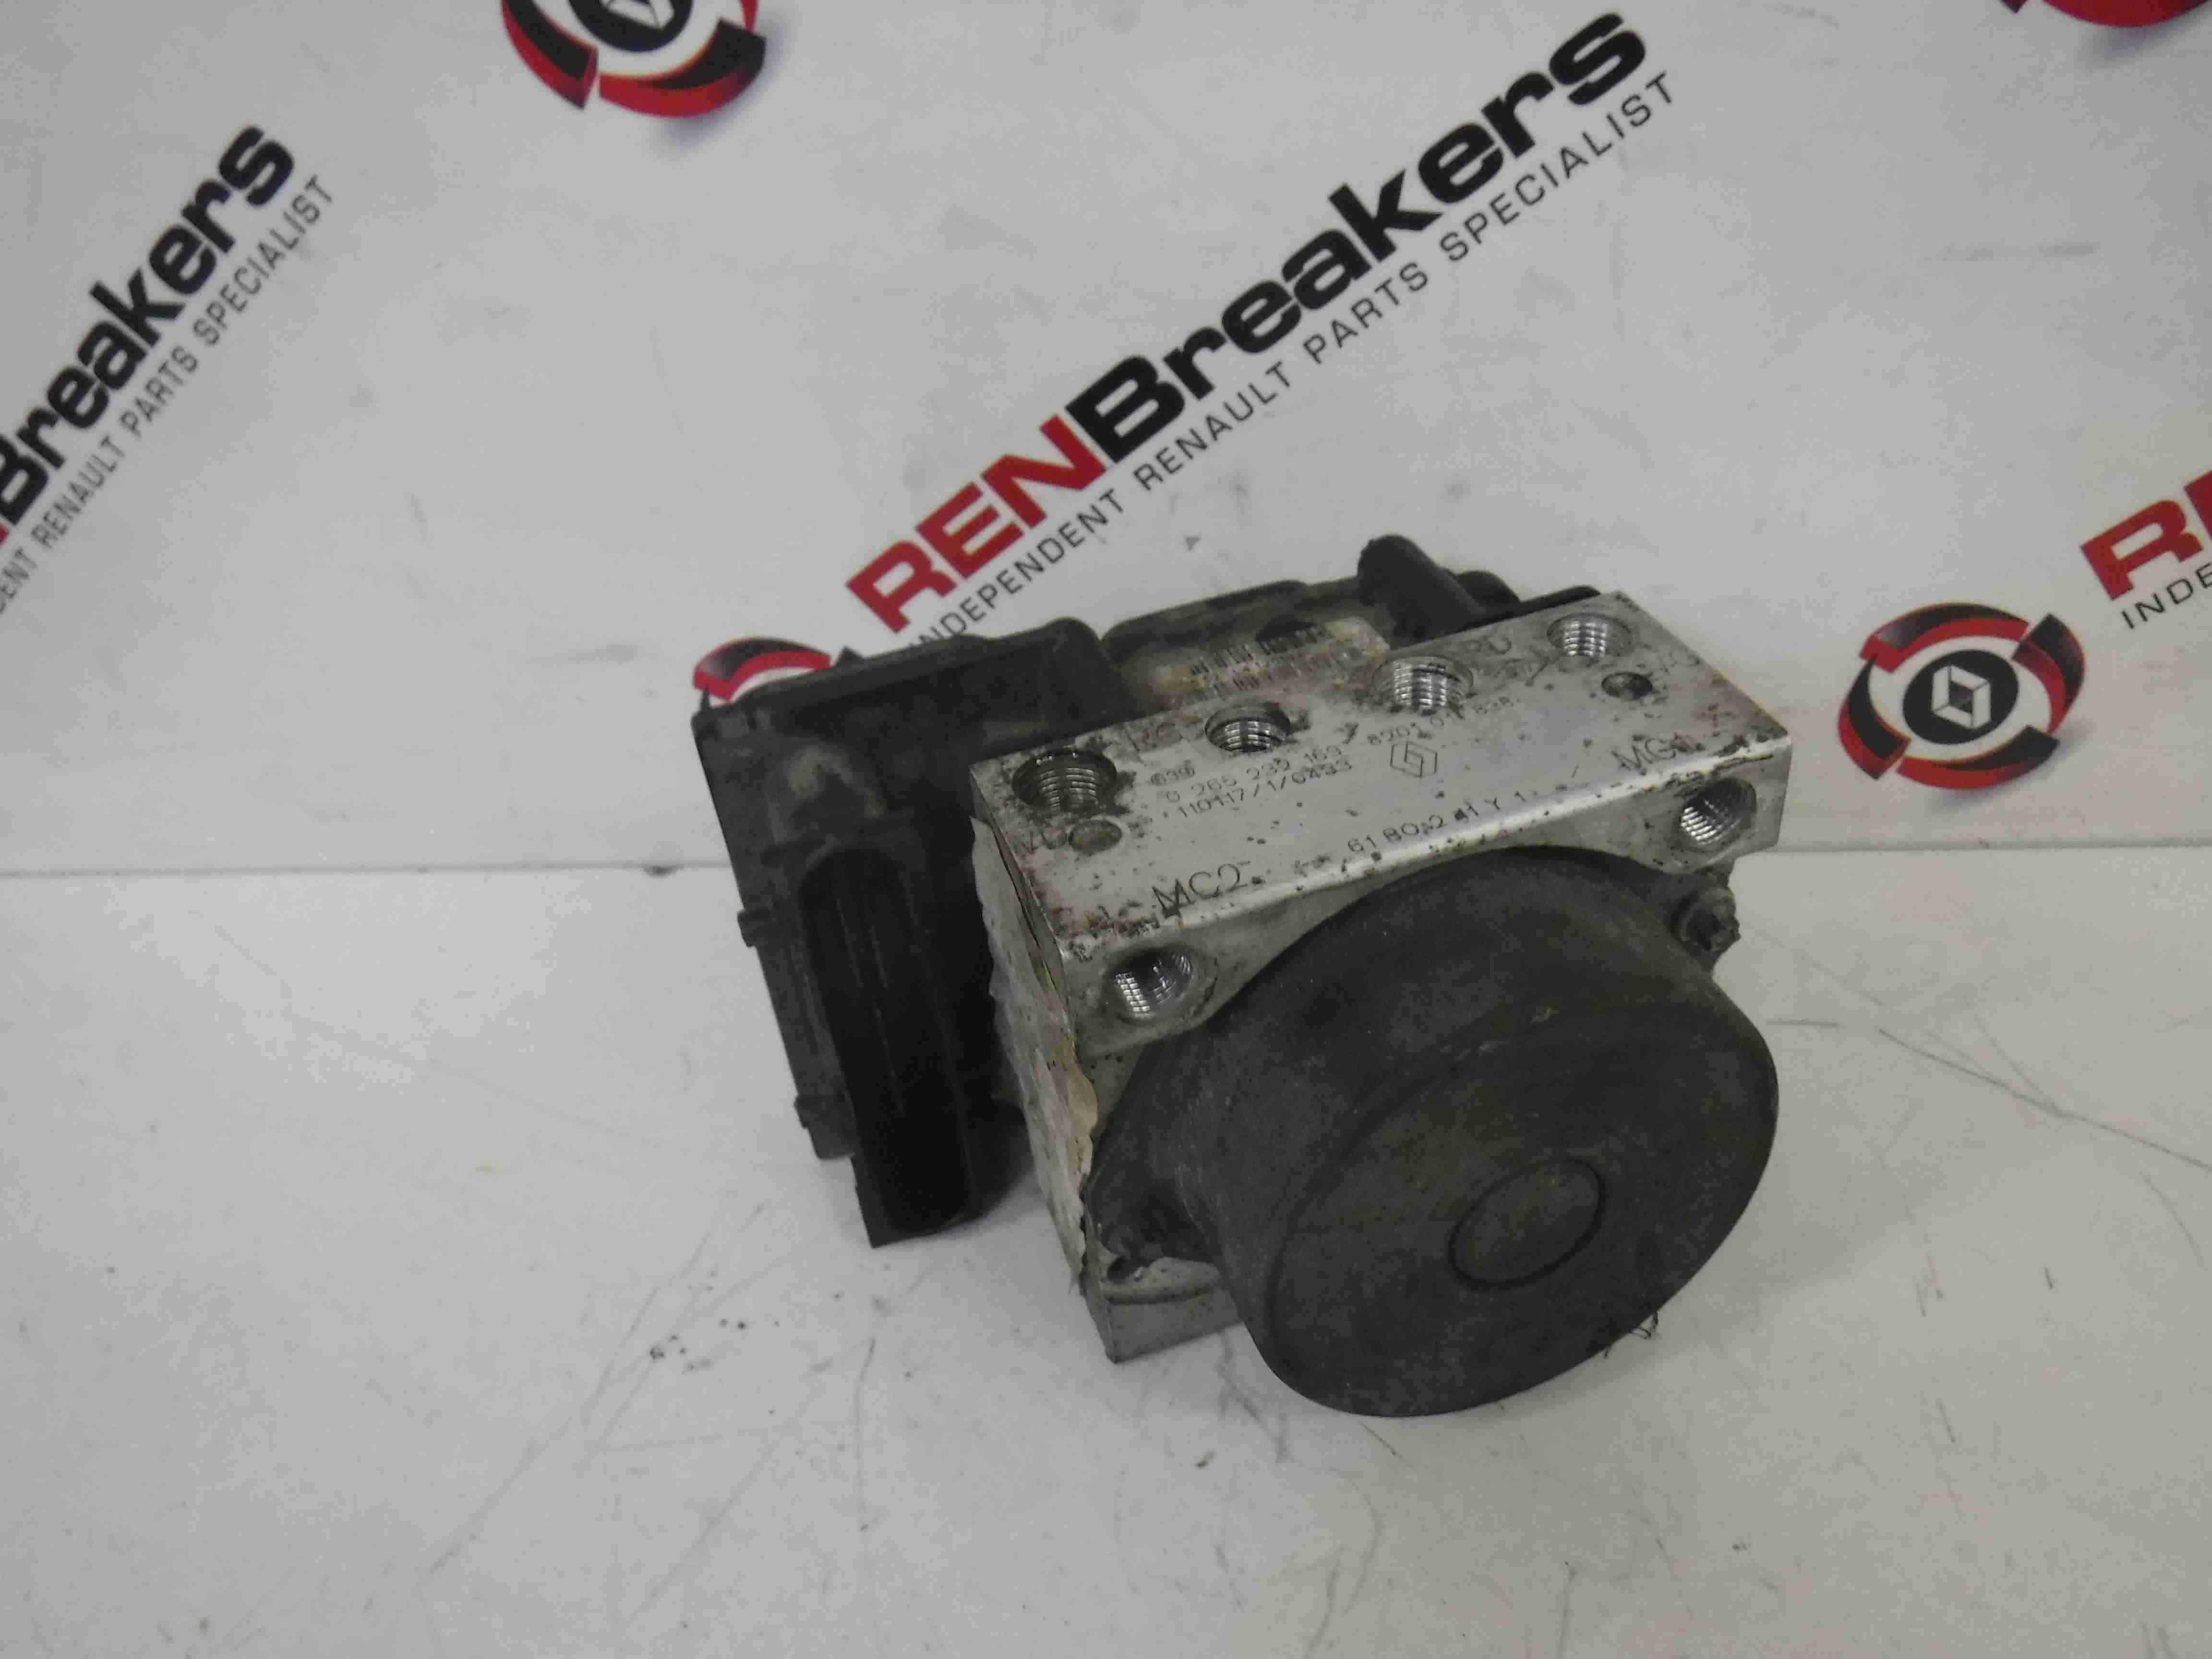 Renault Kangoo 2007-2017 ABS Pump Unit 8201011838 0265232163